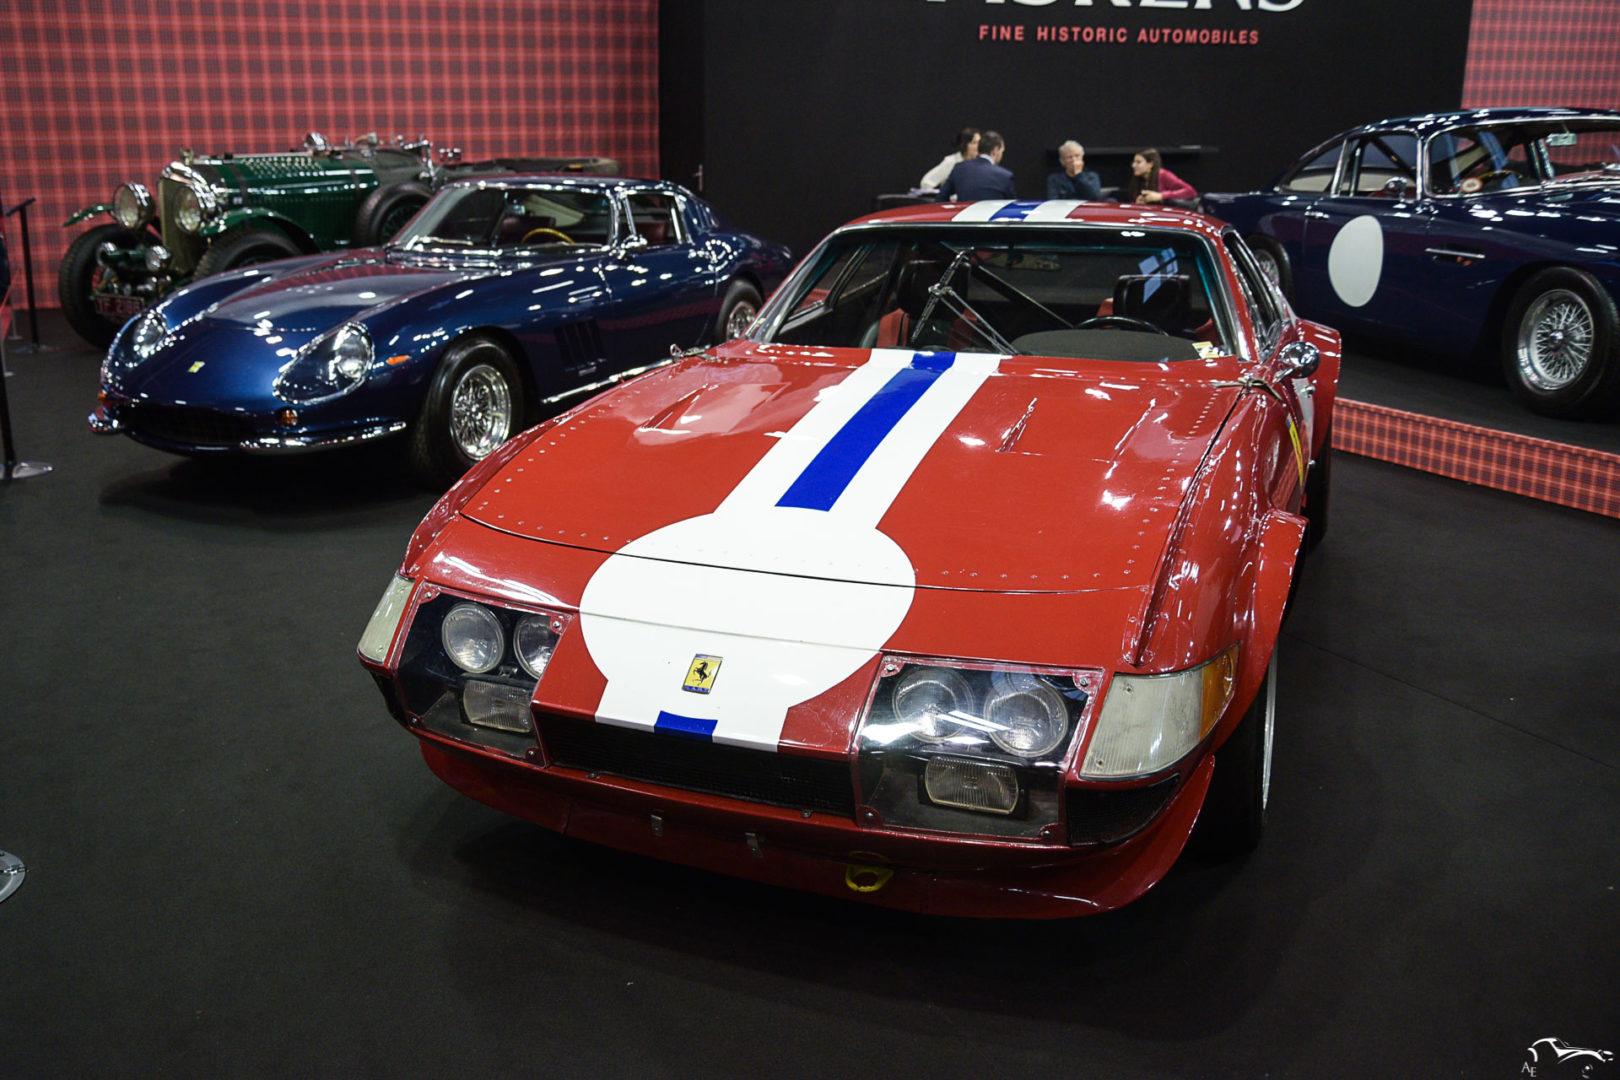 Ferrari Daytona GR4